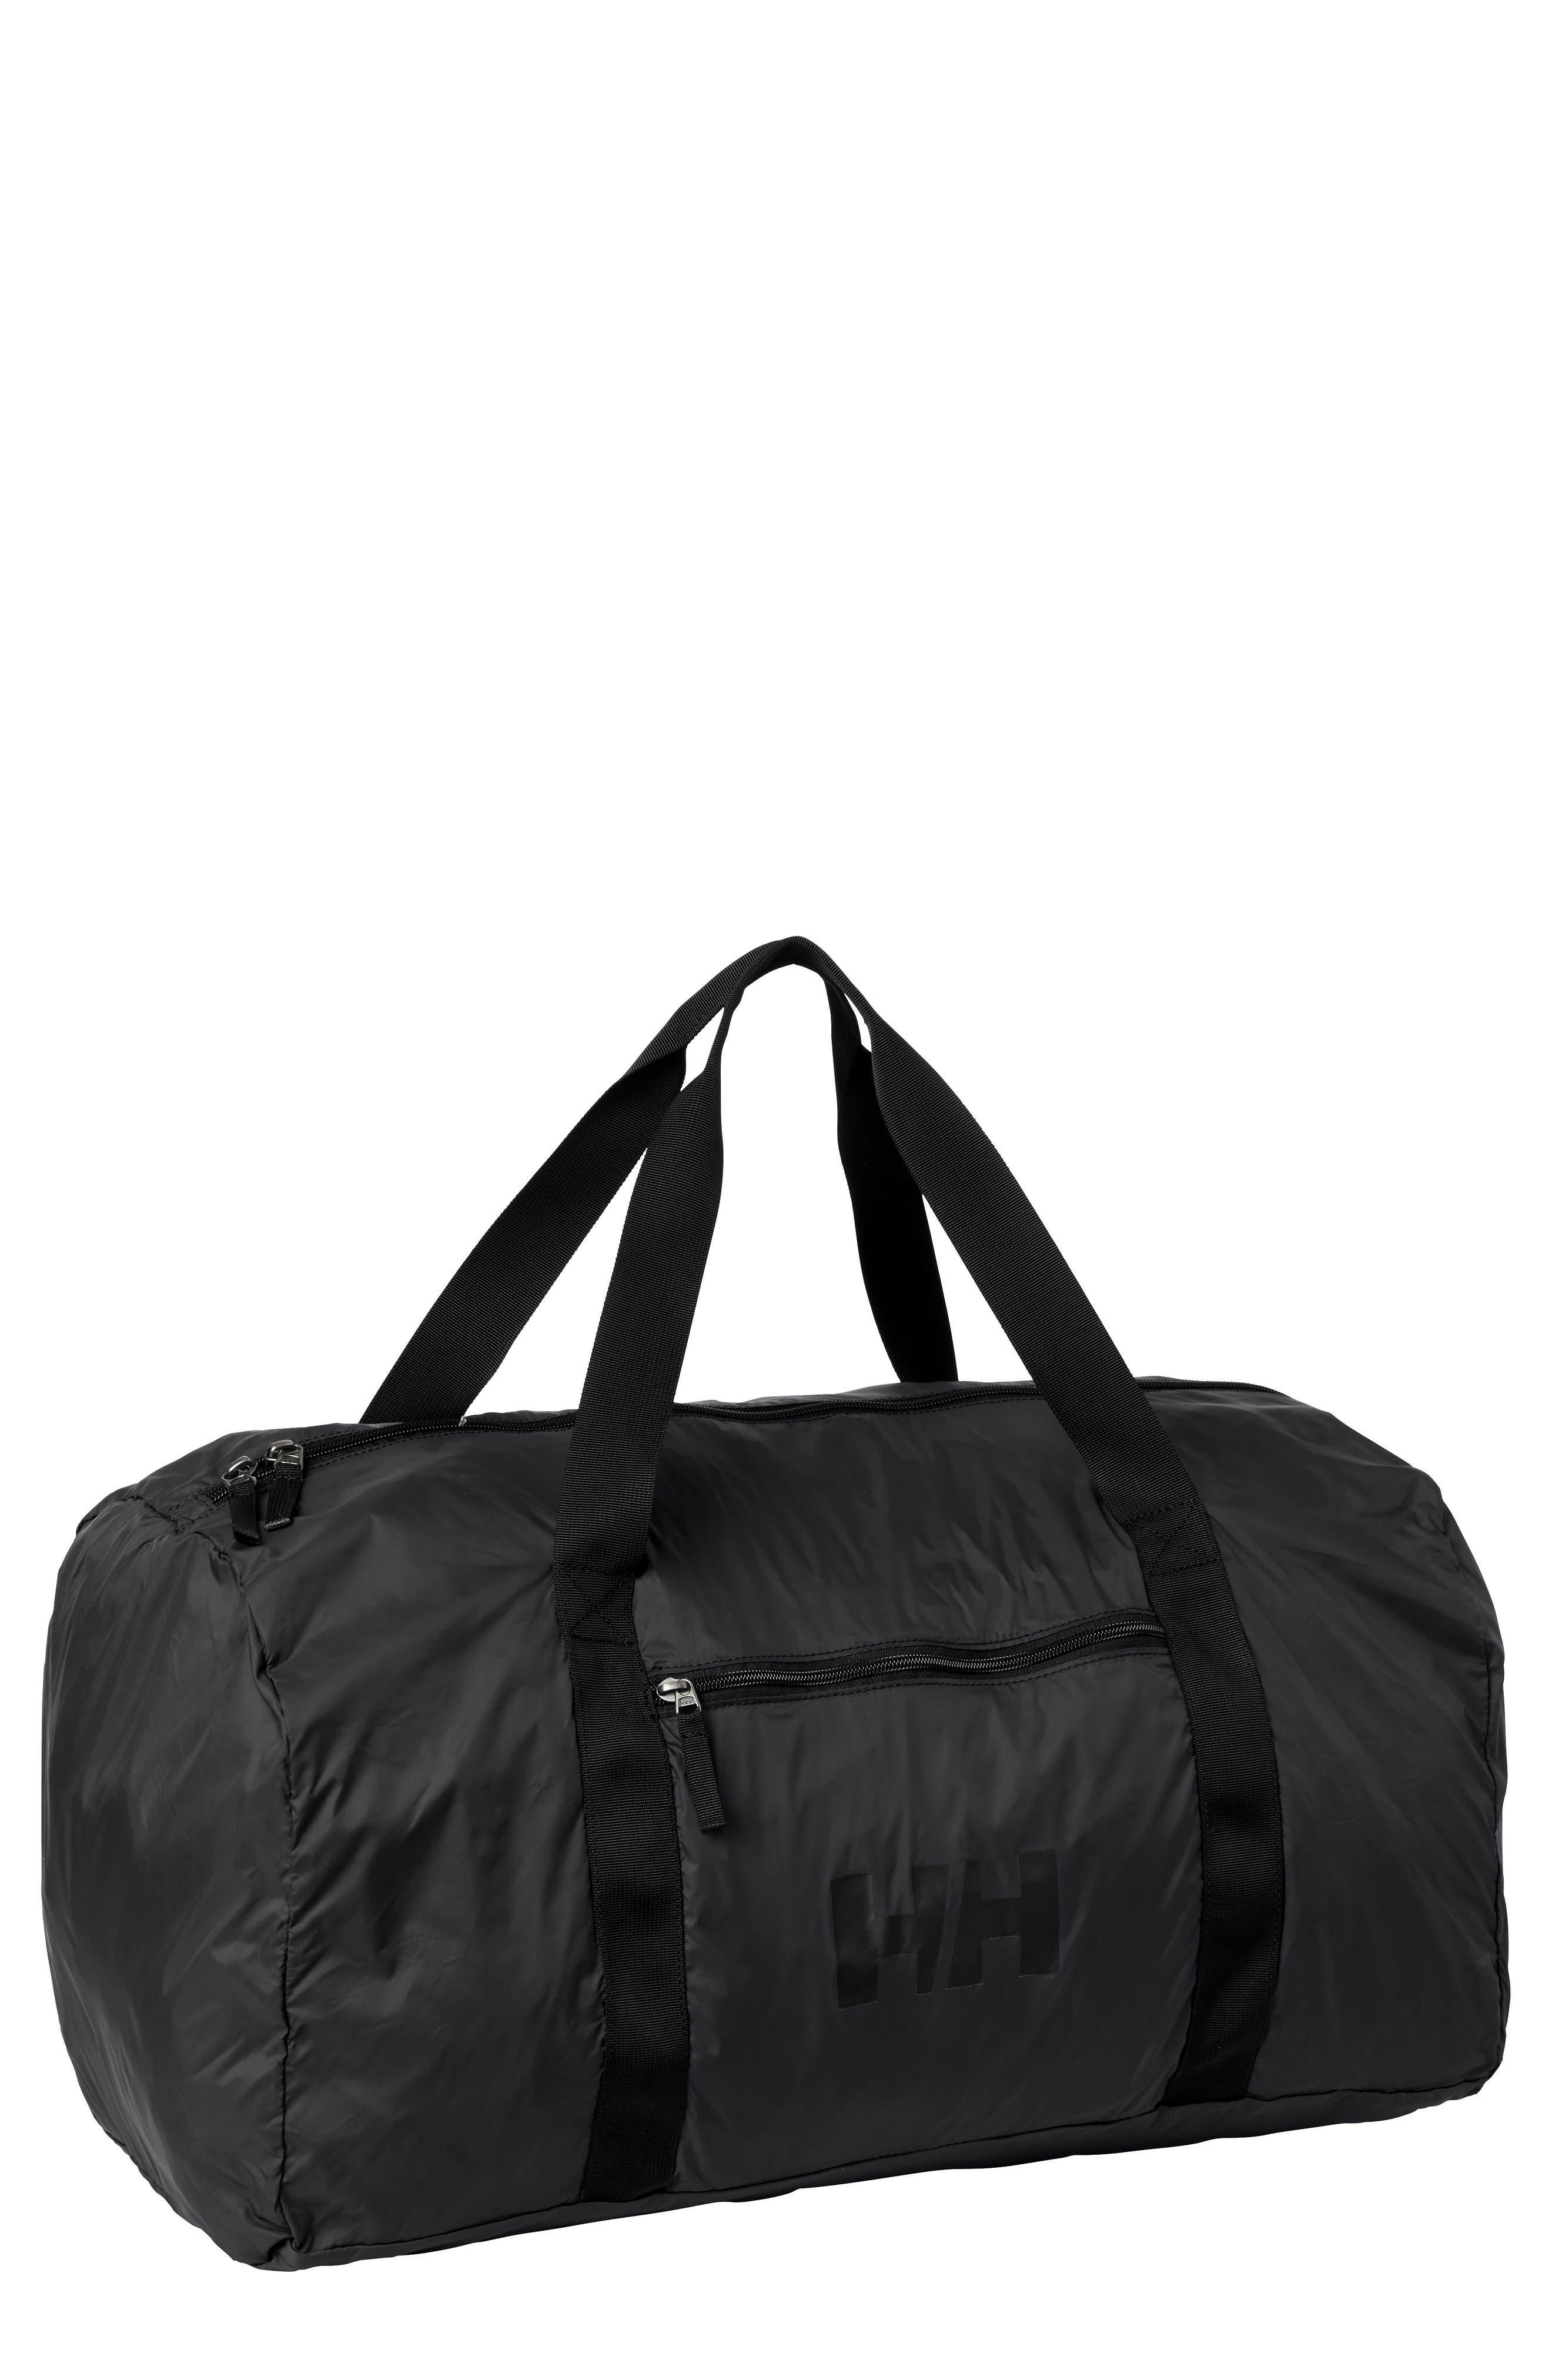 Small Packable Duffel Bag,                         Main,                         color, 001